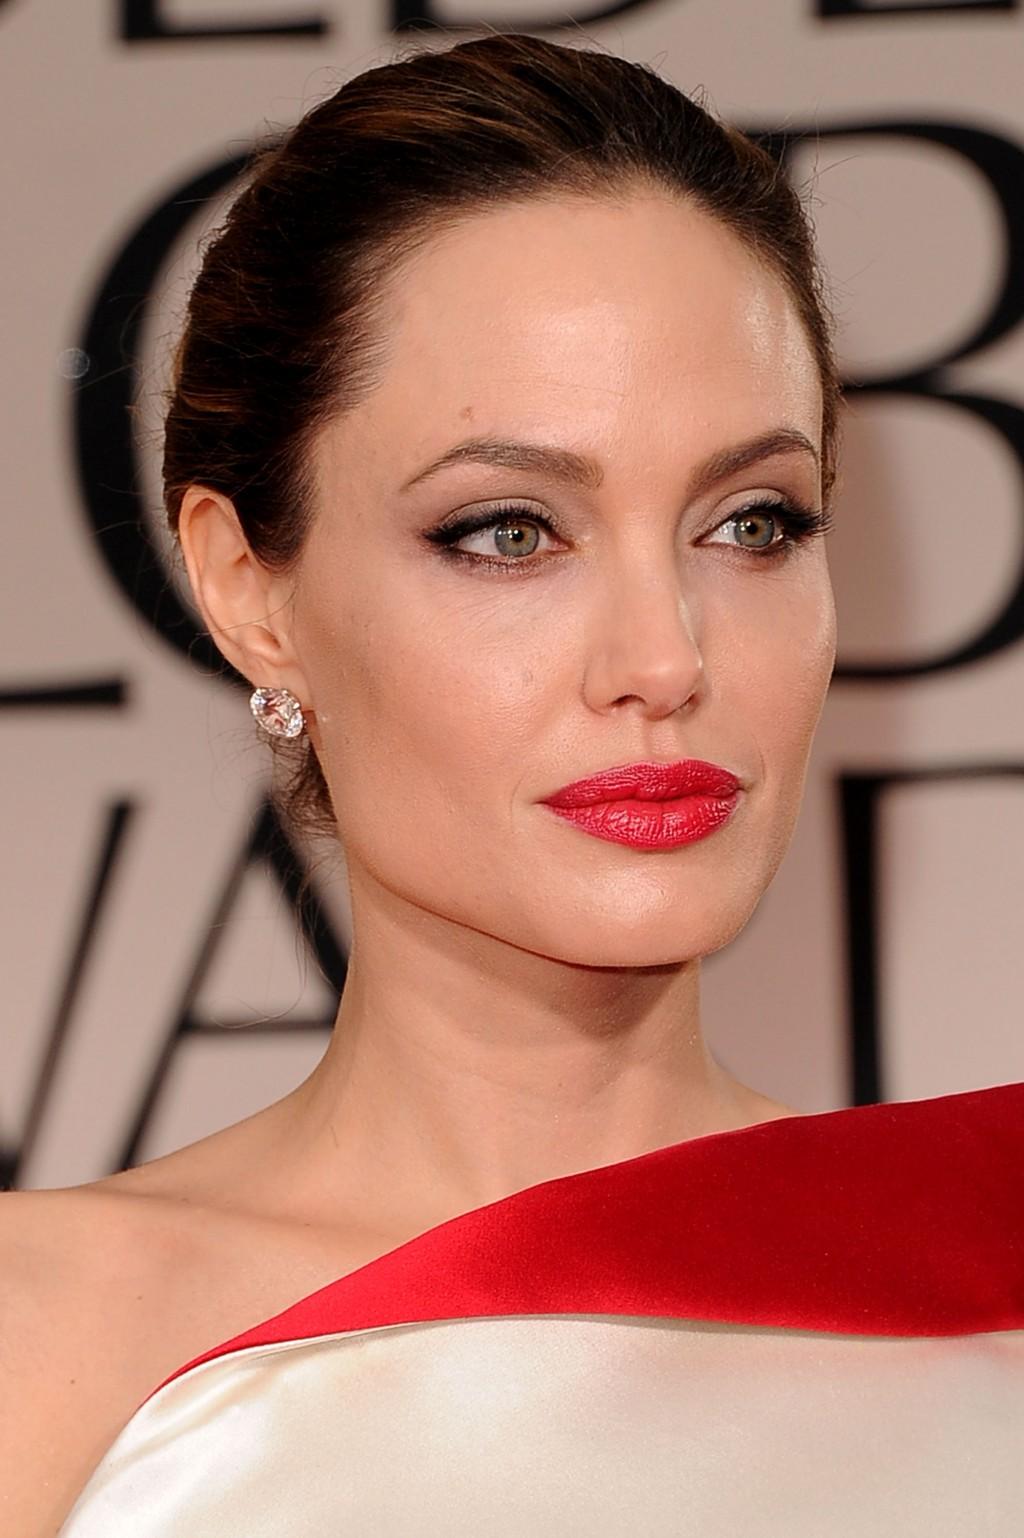 c59db8916b28 Το μακιγιάζ για ένα κόκκινο φόρεμα για μια καστανά μαλλιά παρέχει μια  έμφαση στα χείλη. Τα μάτια είναι καλύτερα να κατανέμονται λίγο με τη  βοήθεια του ...